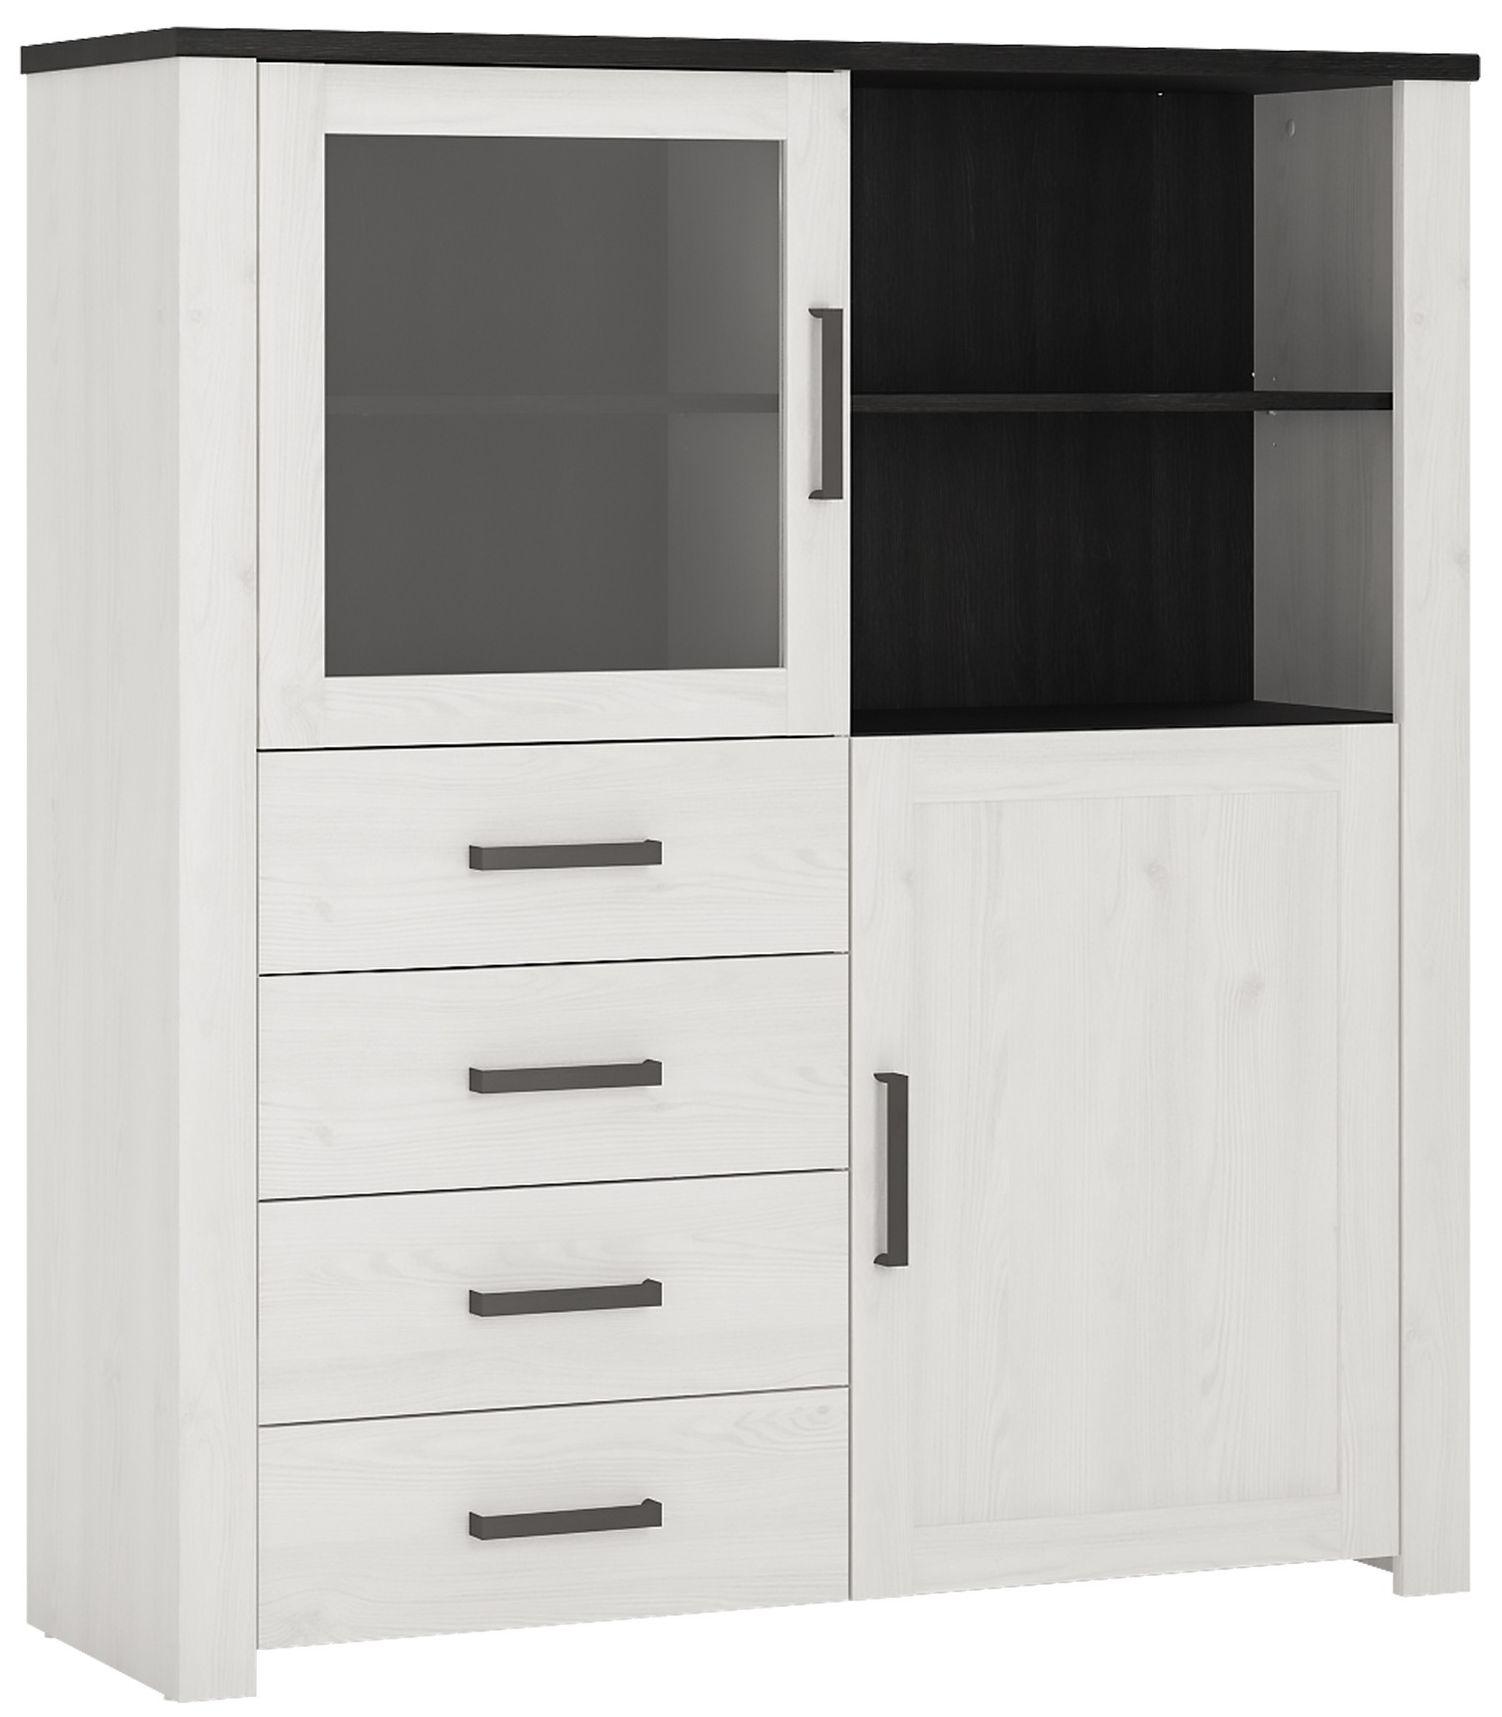 Provence Whitewash Larch Display Cabinet - 2 Door 4 Drawer